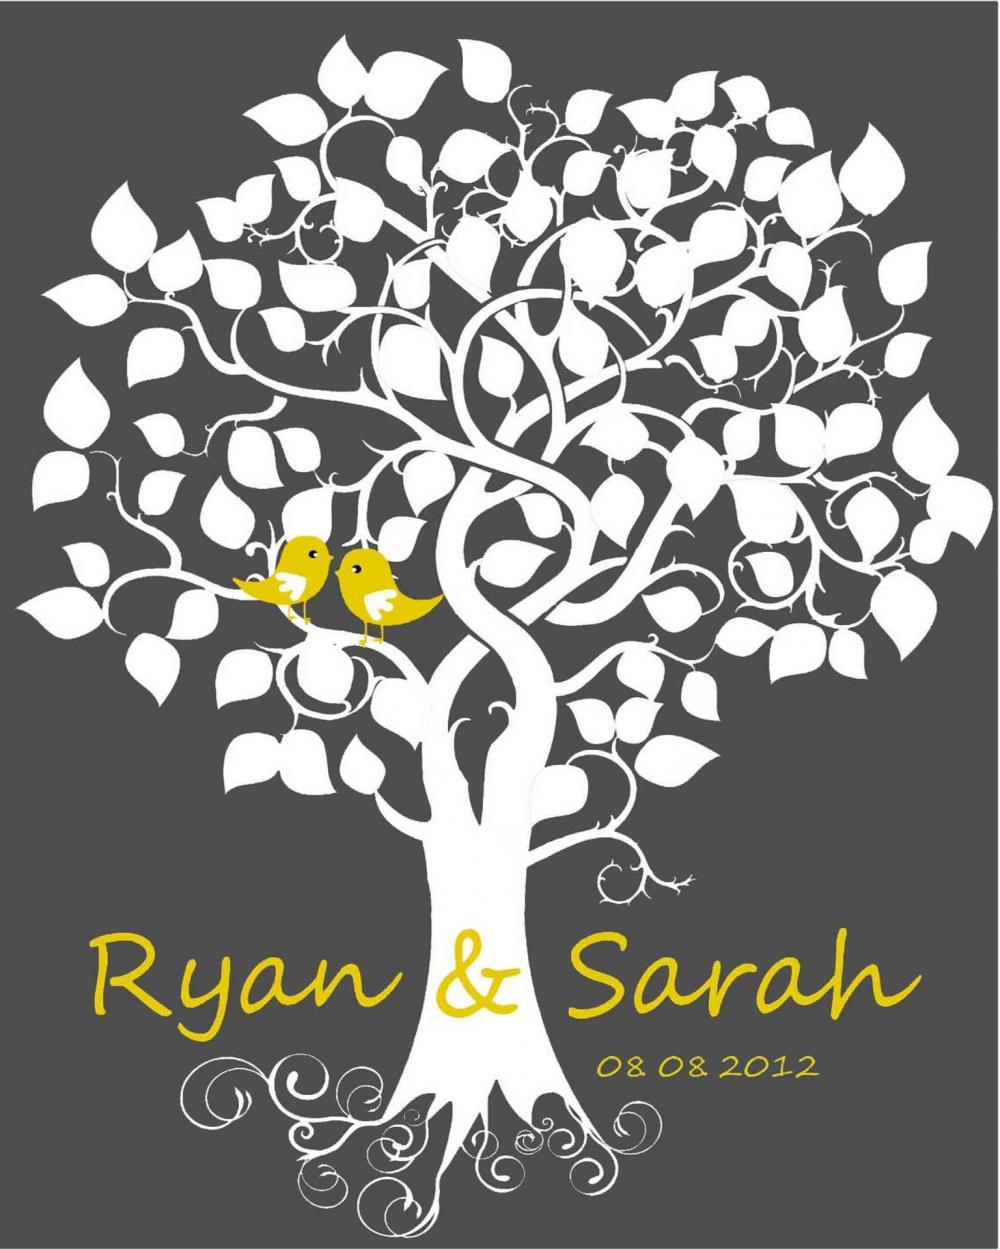 Wedding Guest Signing Tree: Wedding Signature Tree 16x 20 75 Signatures Wedding Guest